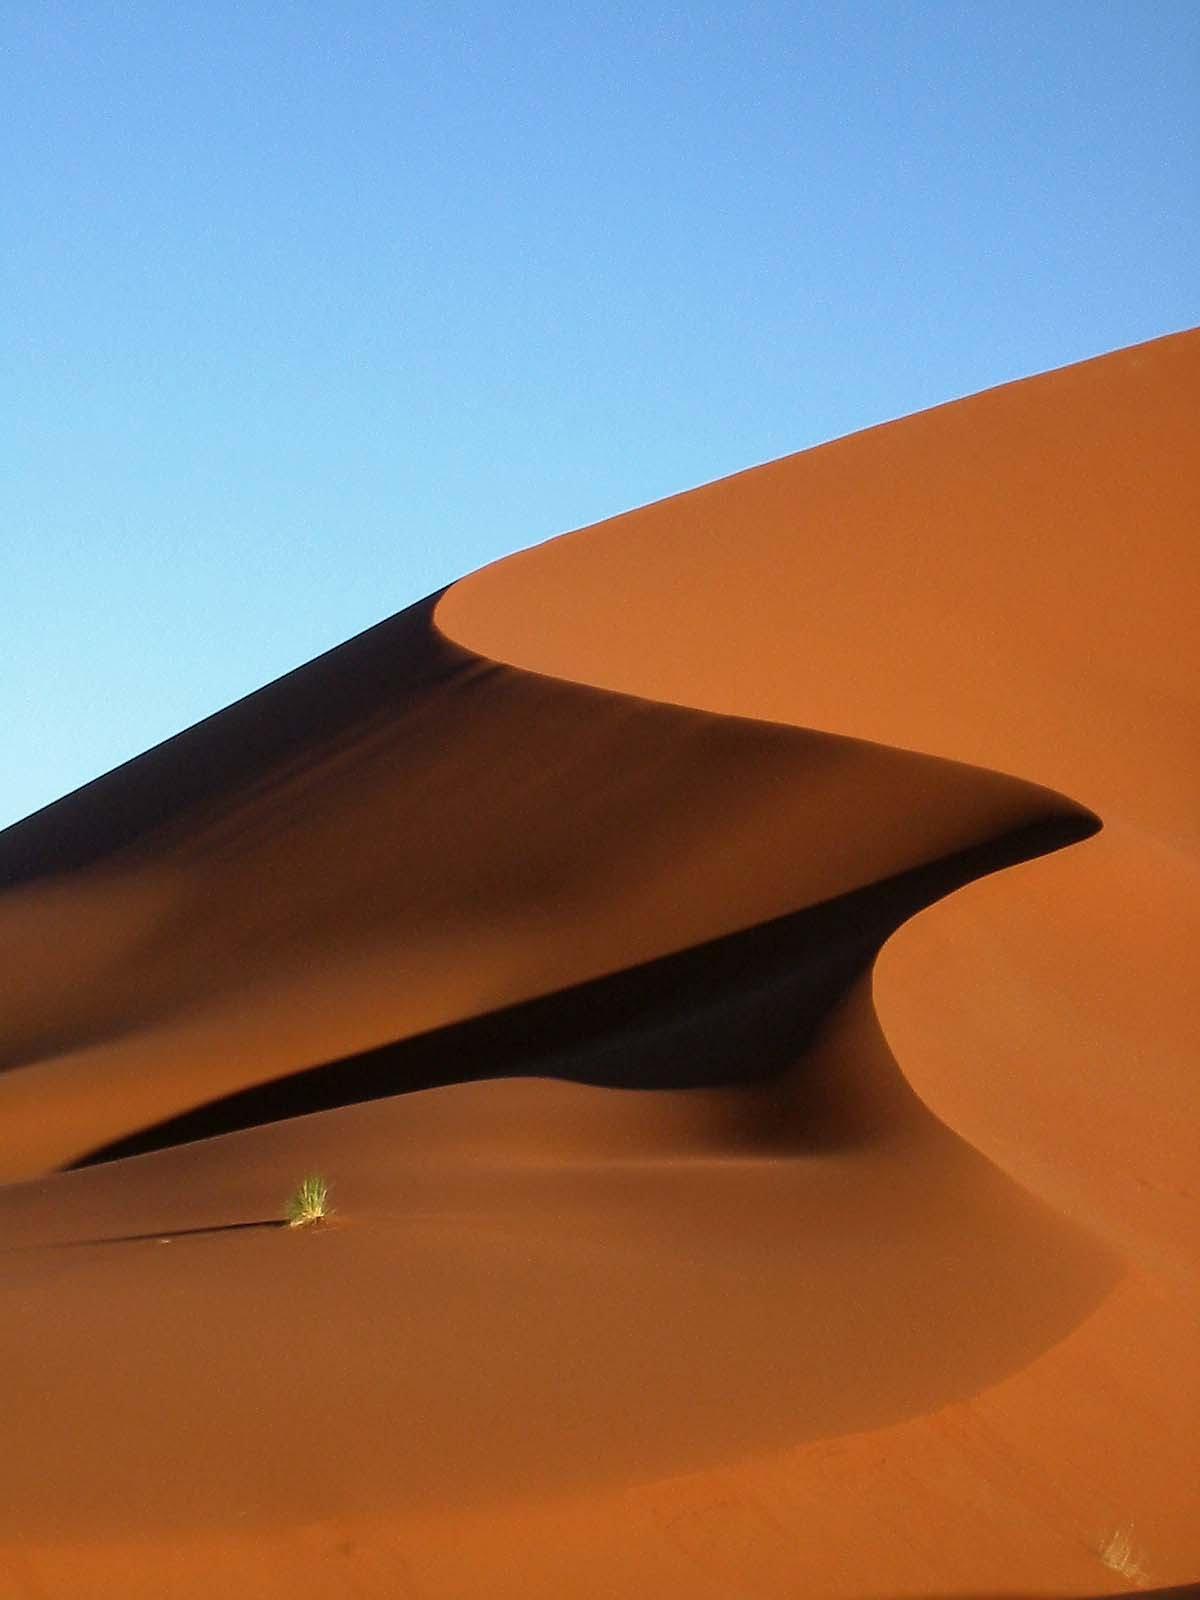 Rain Fall Hd Wallpapers Landscape Of The Desert Thewonderful99